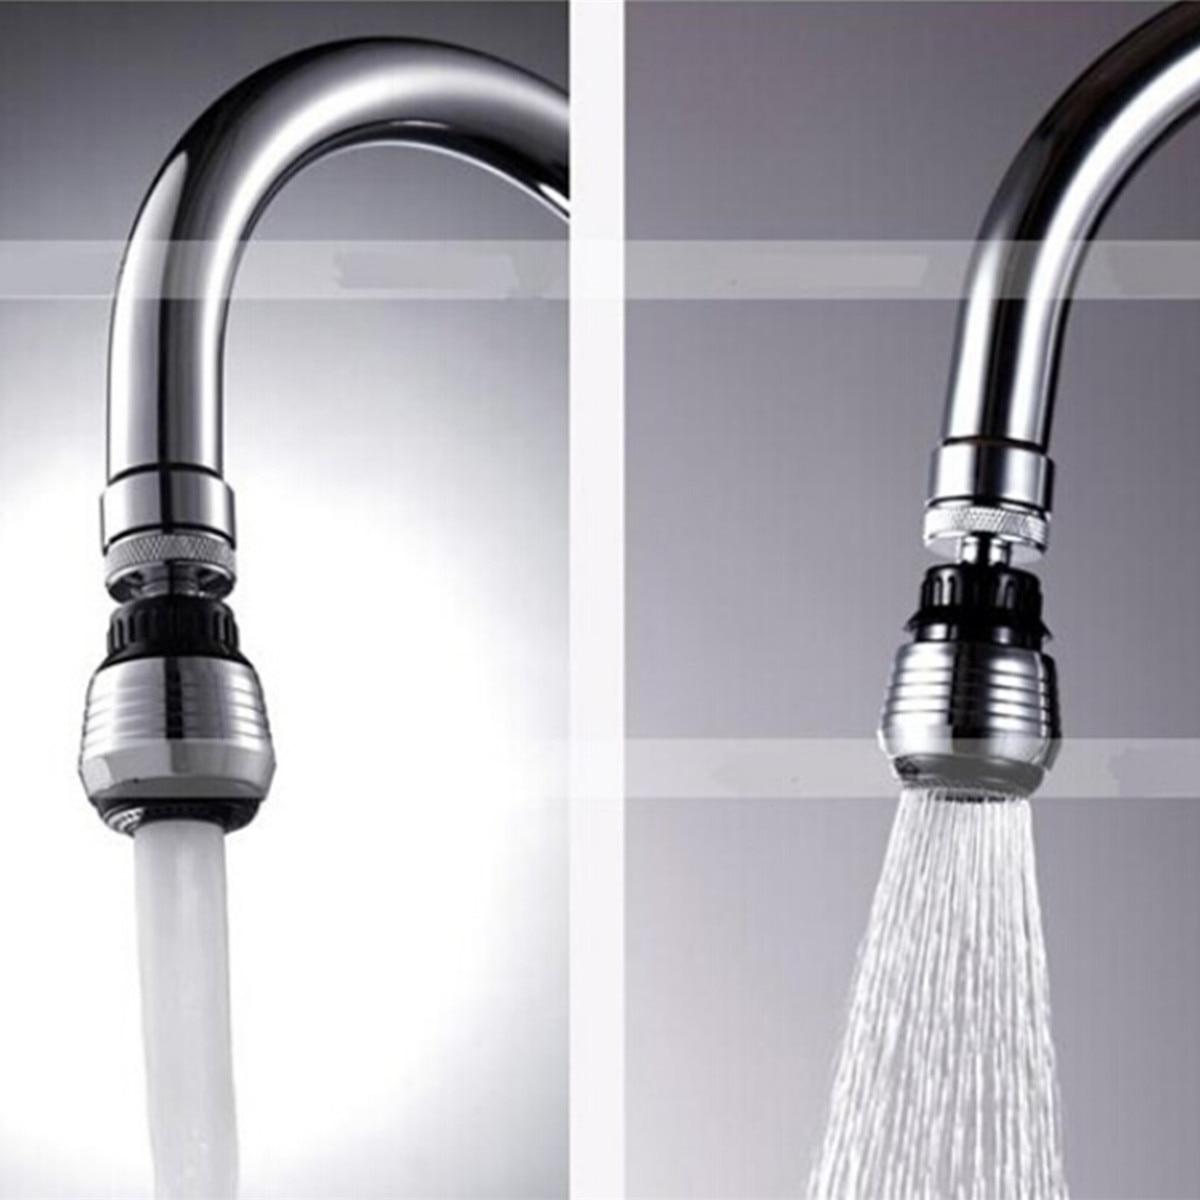 Kitchen Faucet Swivel Aerator Online Get Cheap Kitchen Faucet Aerator Aliexpresscom Alibaba